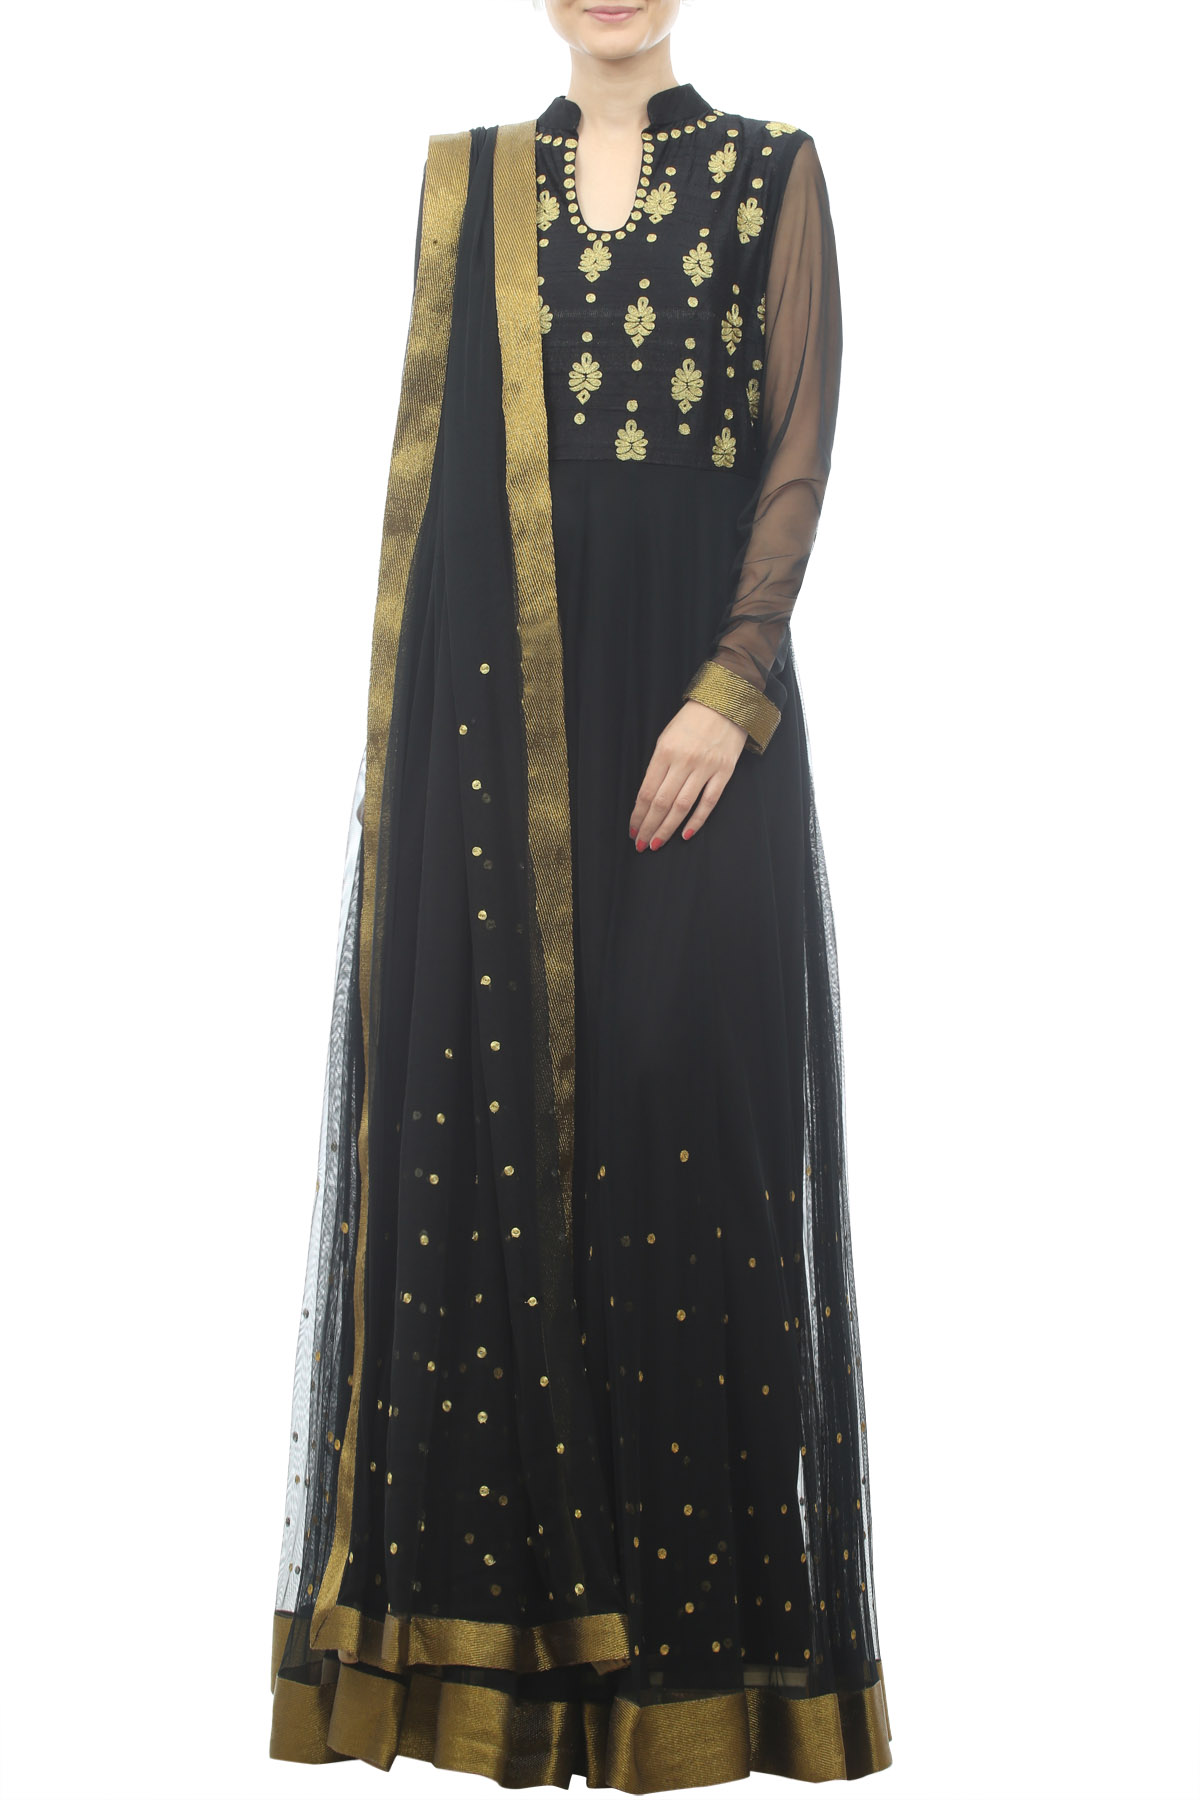 Black Floor Length Anarkali with Zari Embroidery &Dupatta